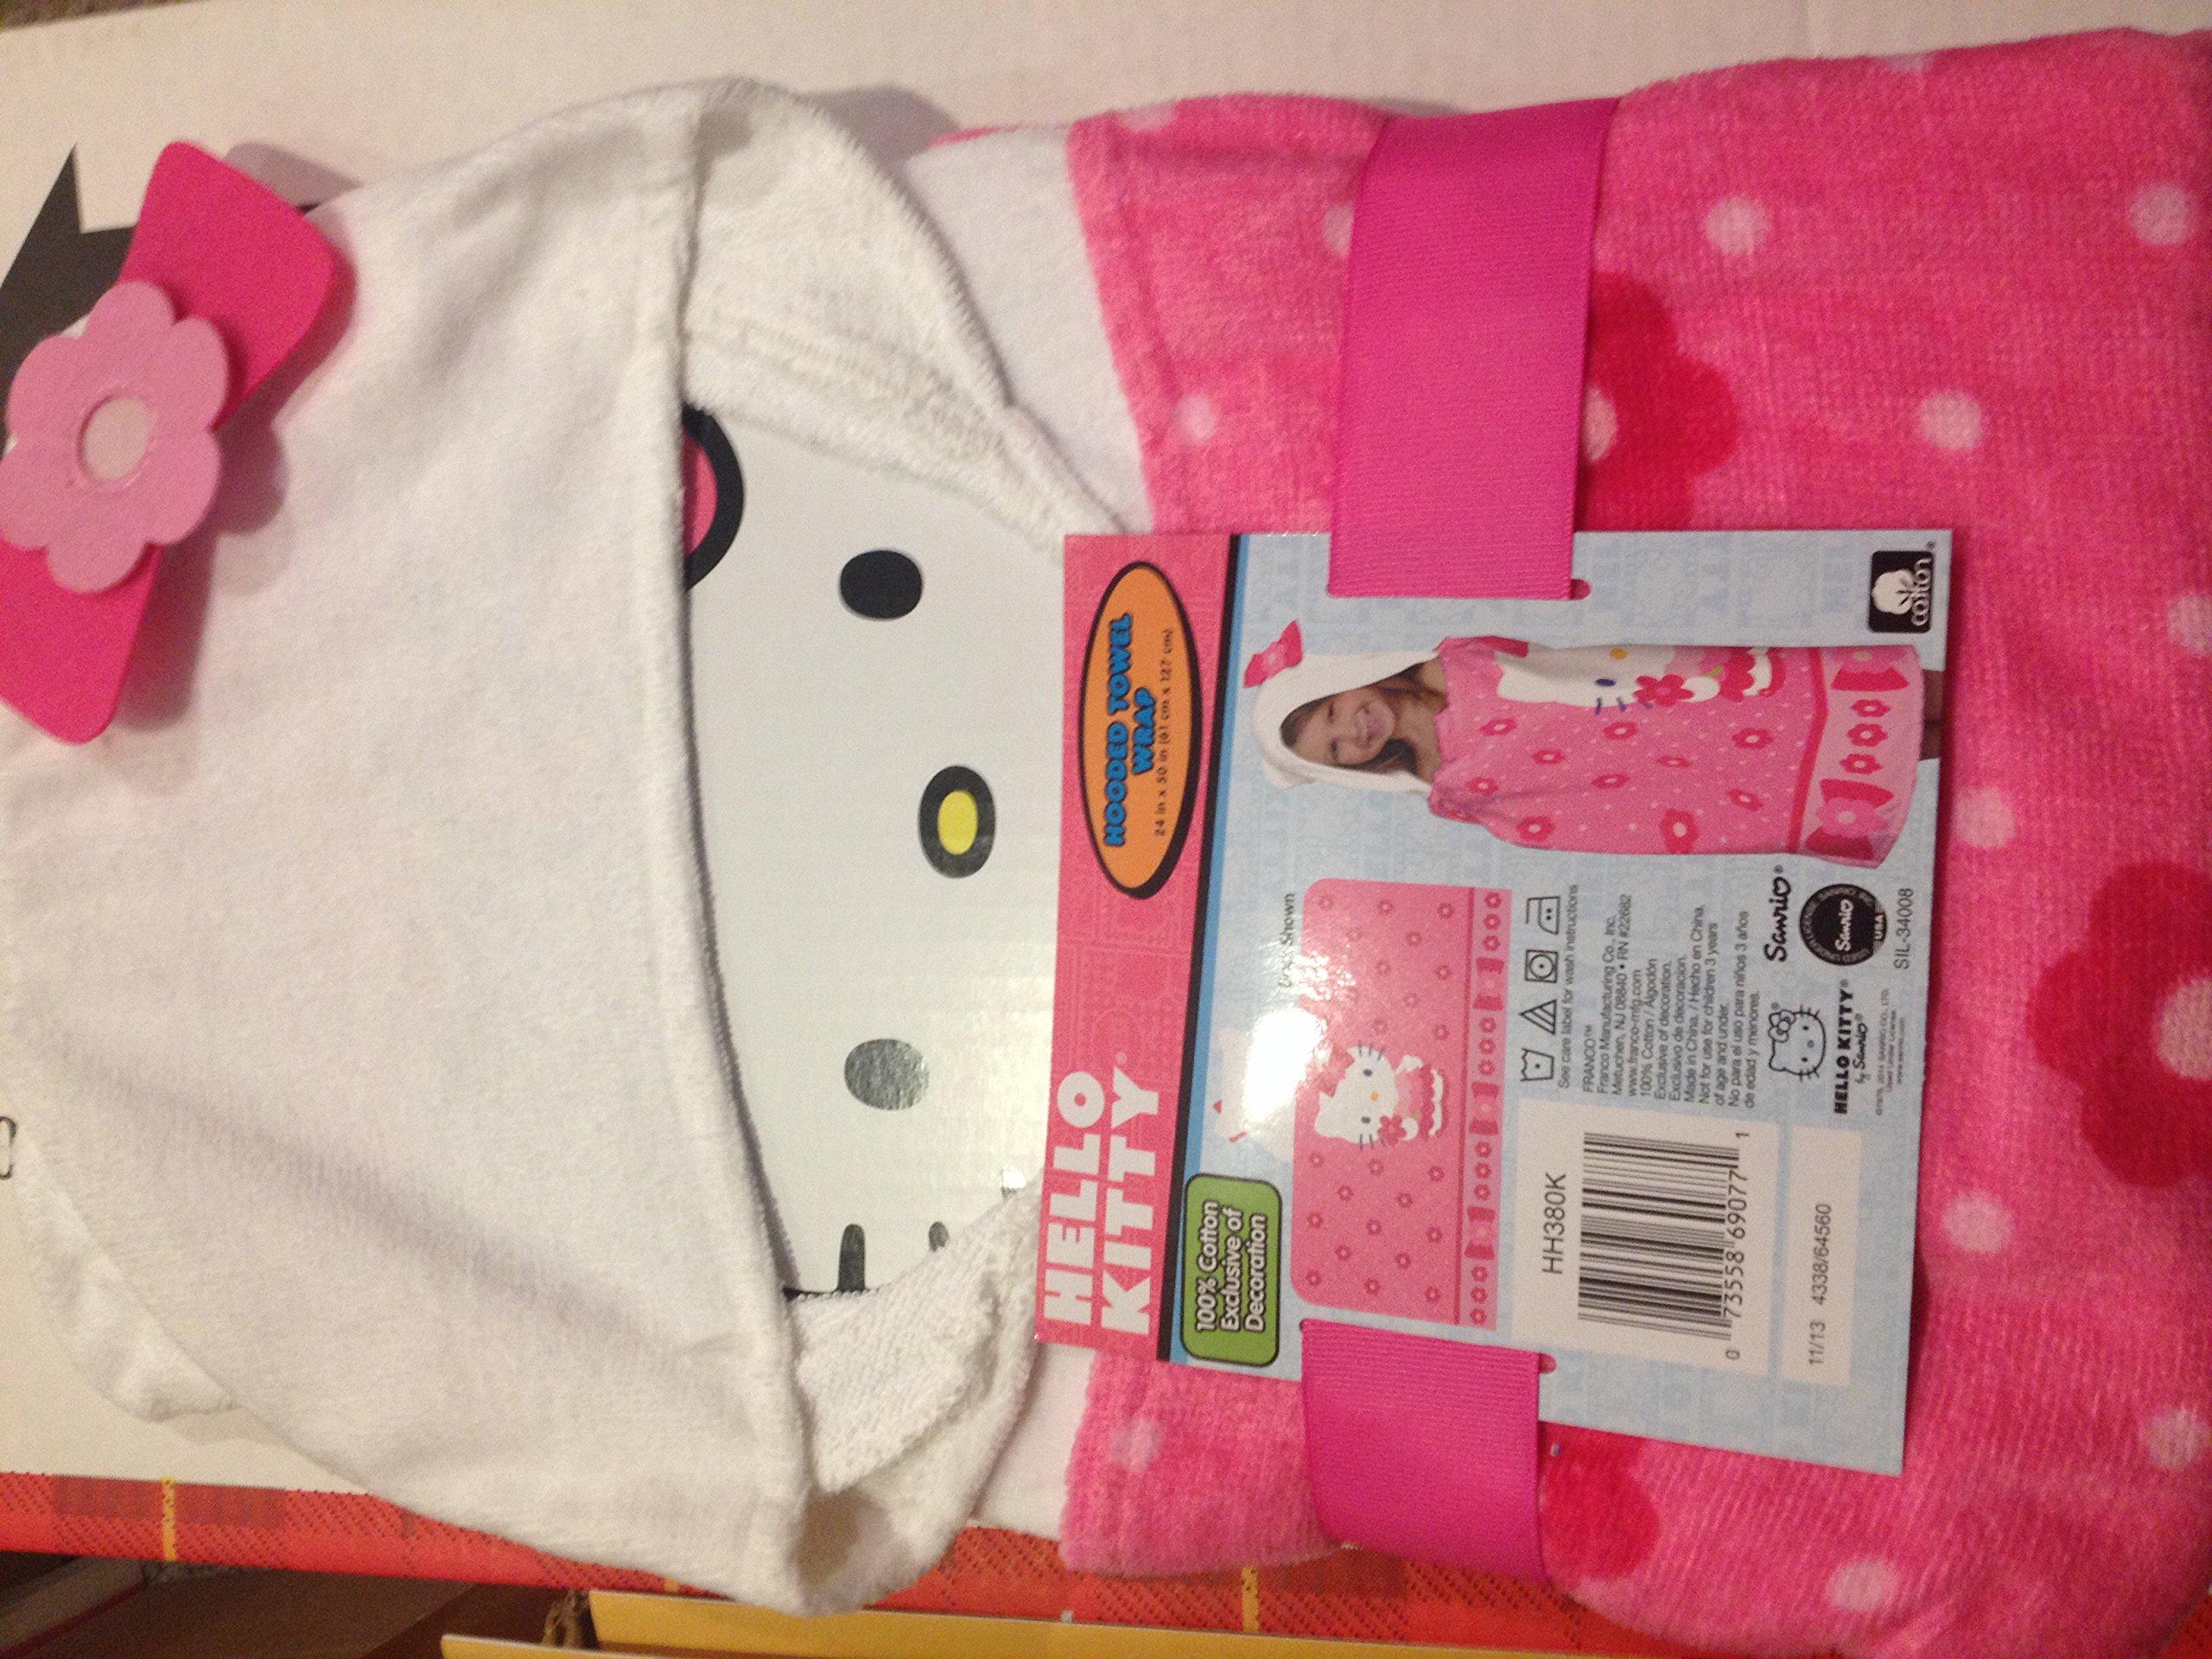 Hello Kitty Hooded Towel Wrap #4338/64560